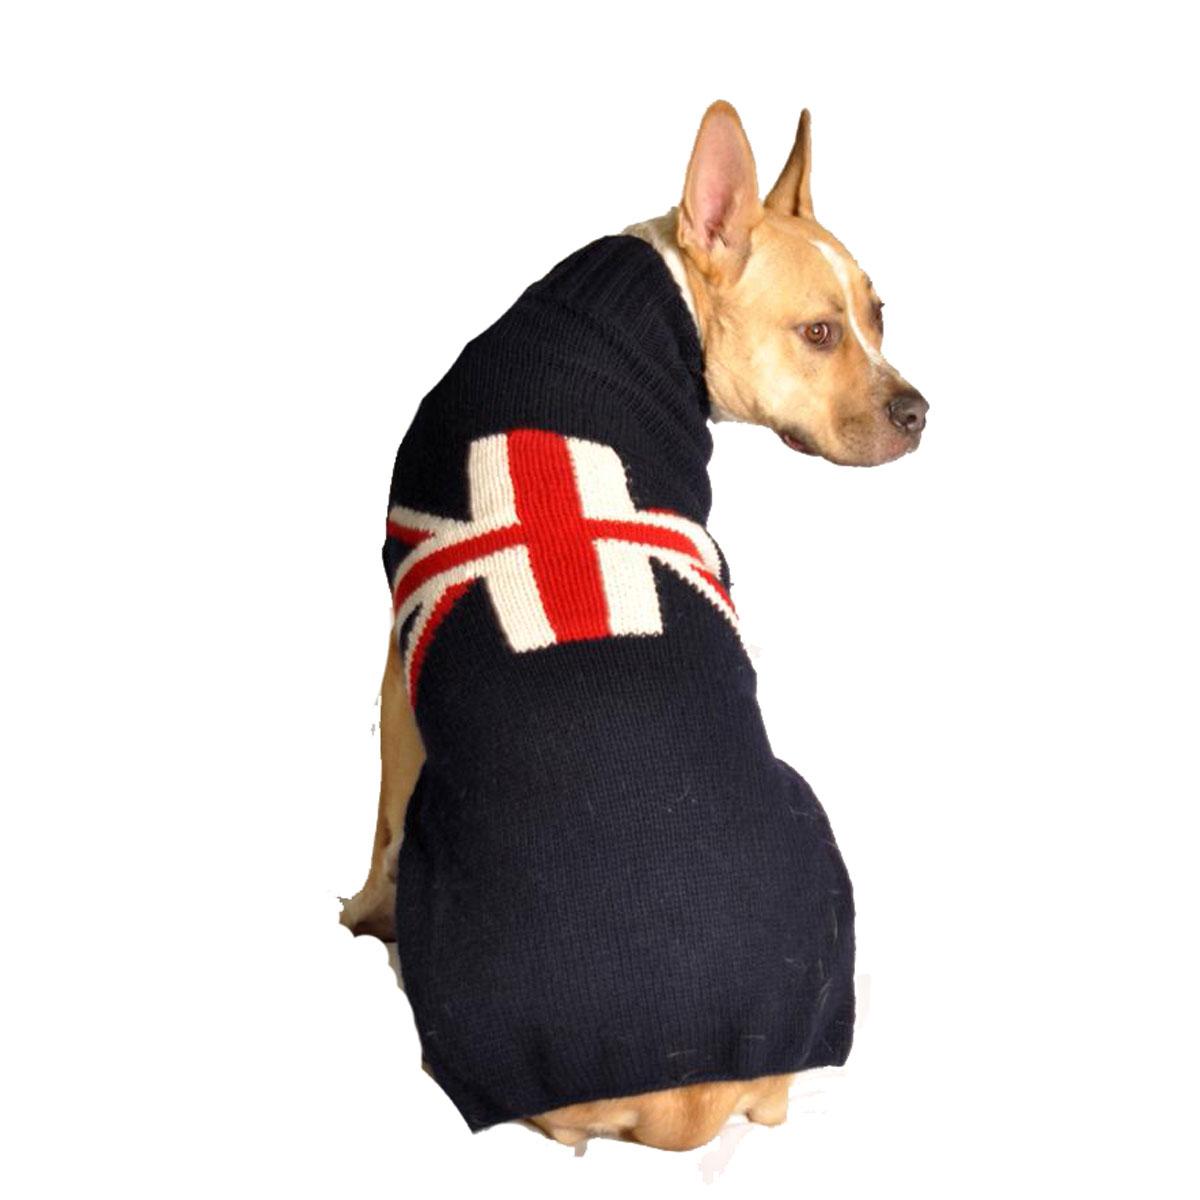 Handmade Union Jack Wool Dog Sweater